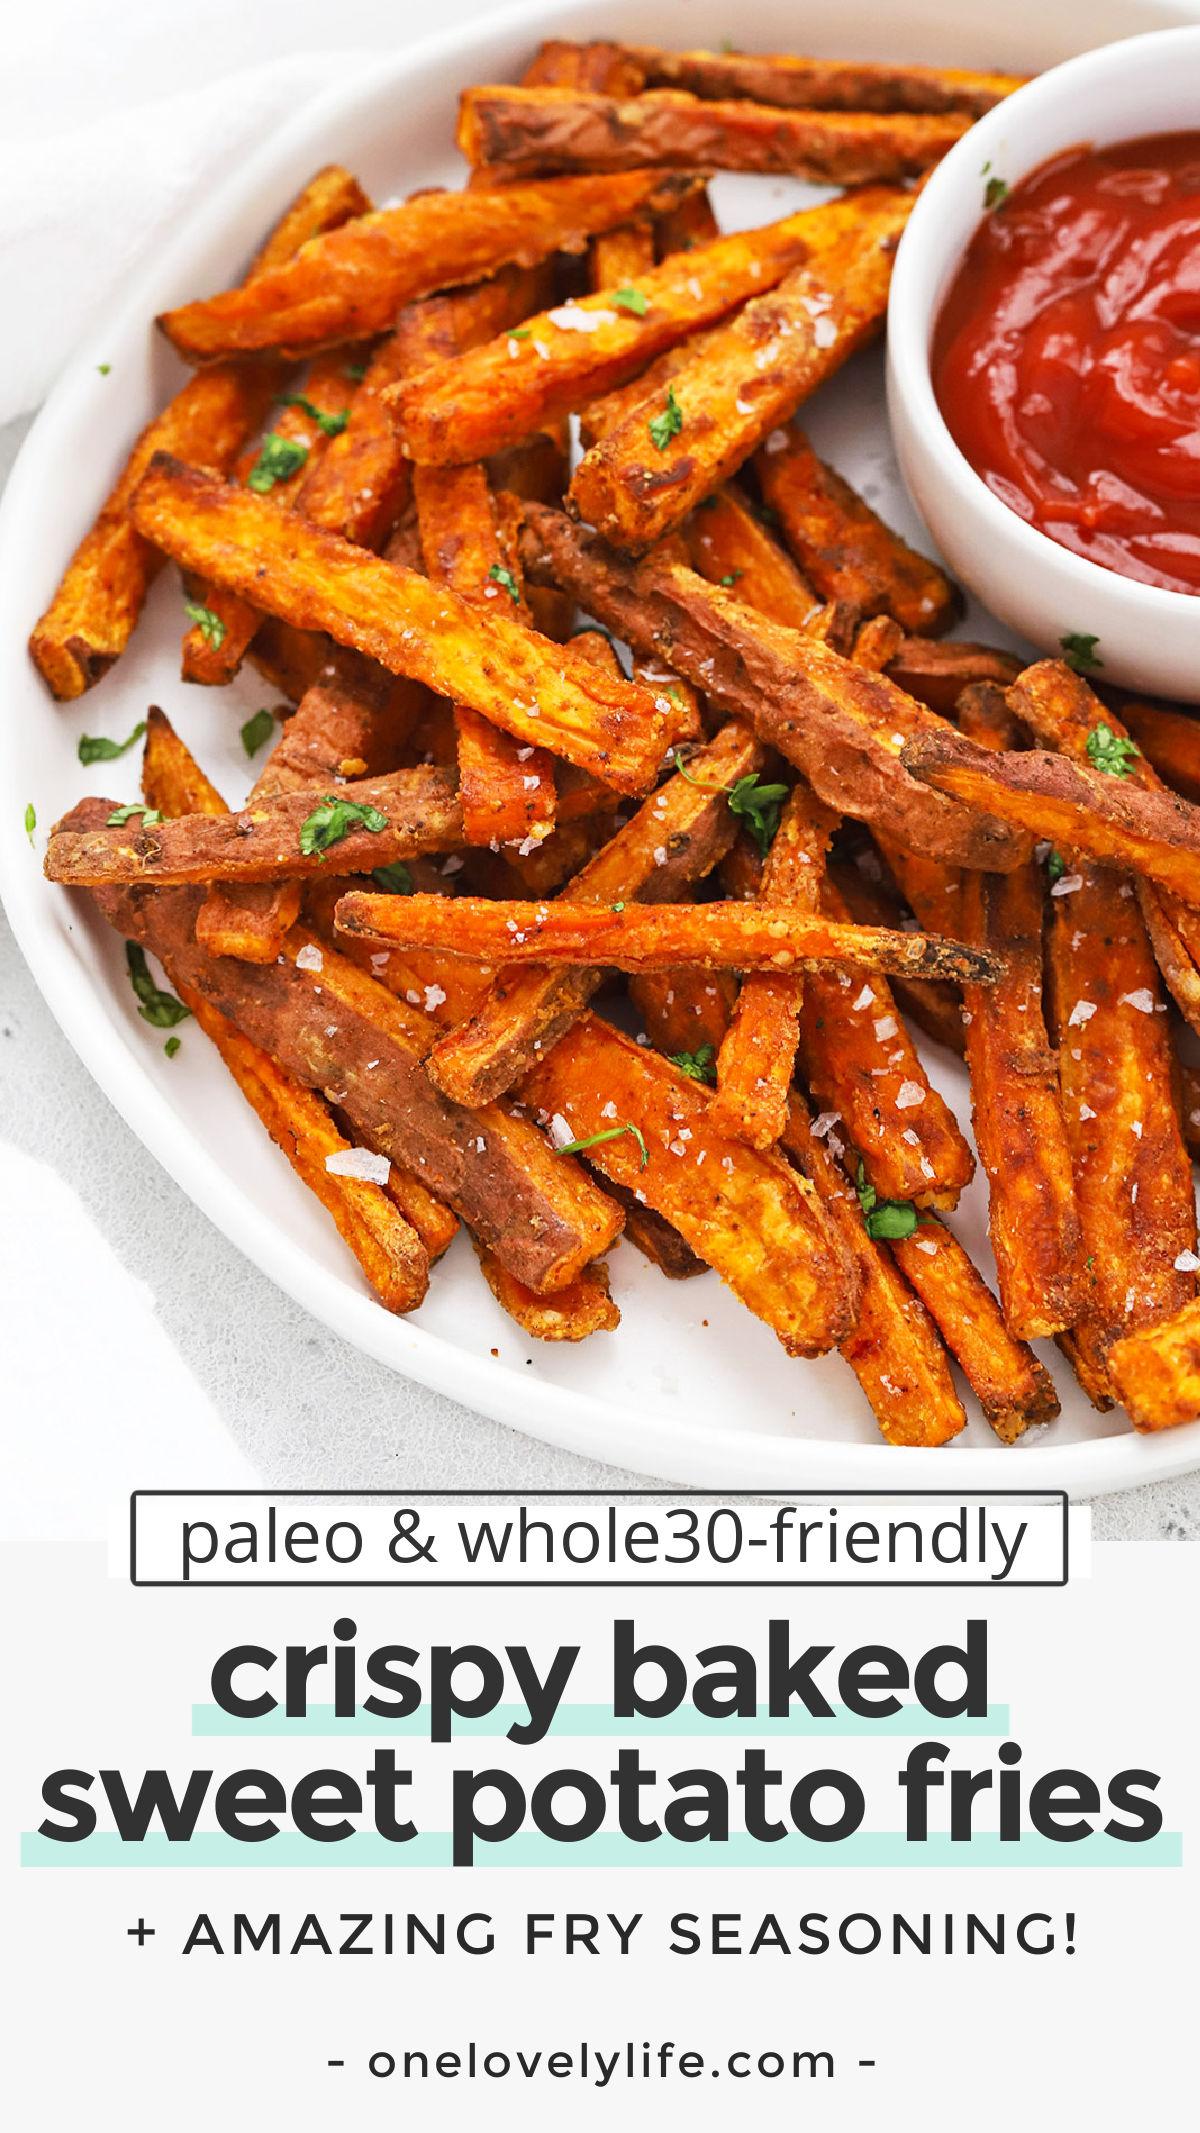 Crispy Baked Sweet Potato Fries - How to make crispy baked sweet potato fries & the best fry seasoning! (Paleo, Whole30, Gluten-Free) // Sweet Potato Oven Fries // Paleo Sweet Potato Fries // Whole30 Sweet Potato Fries // Healthy Sweet Potato Fries #sweetpotatofries #ovenfries #paleo #whole30 #vegan #glutenfree